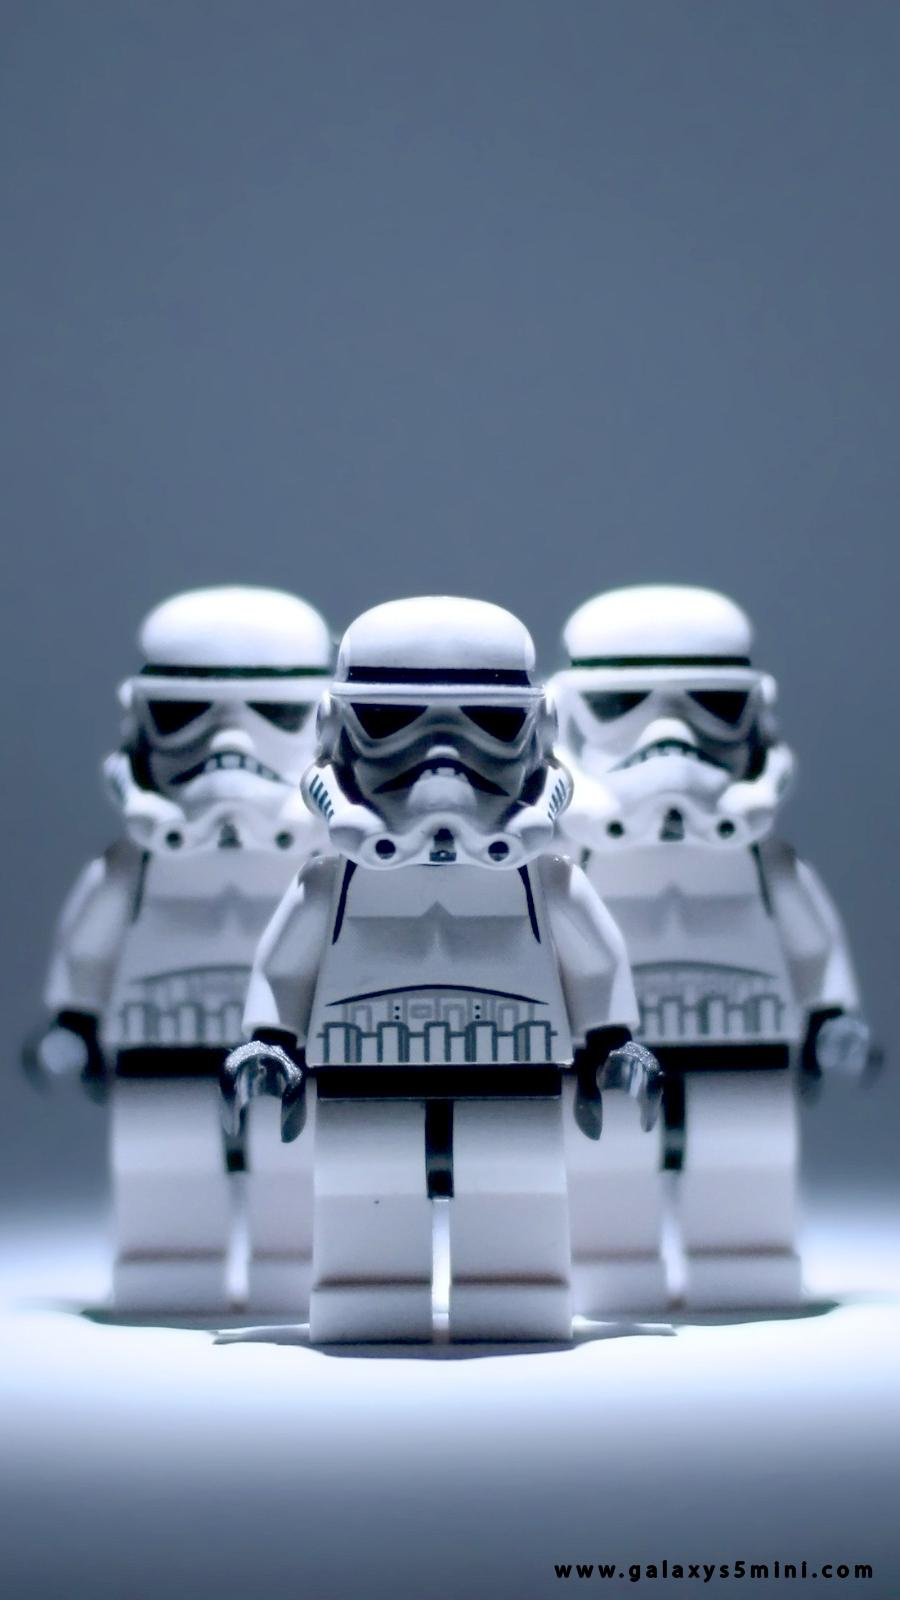 49 Star Wars Phone Wallpaper Hd On Wallpapersafari